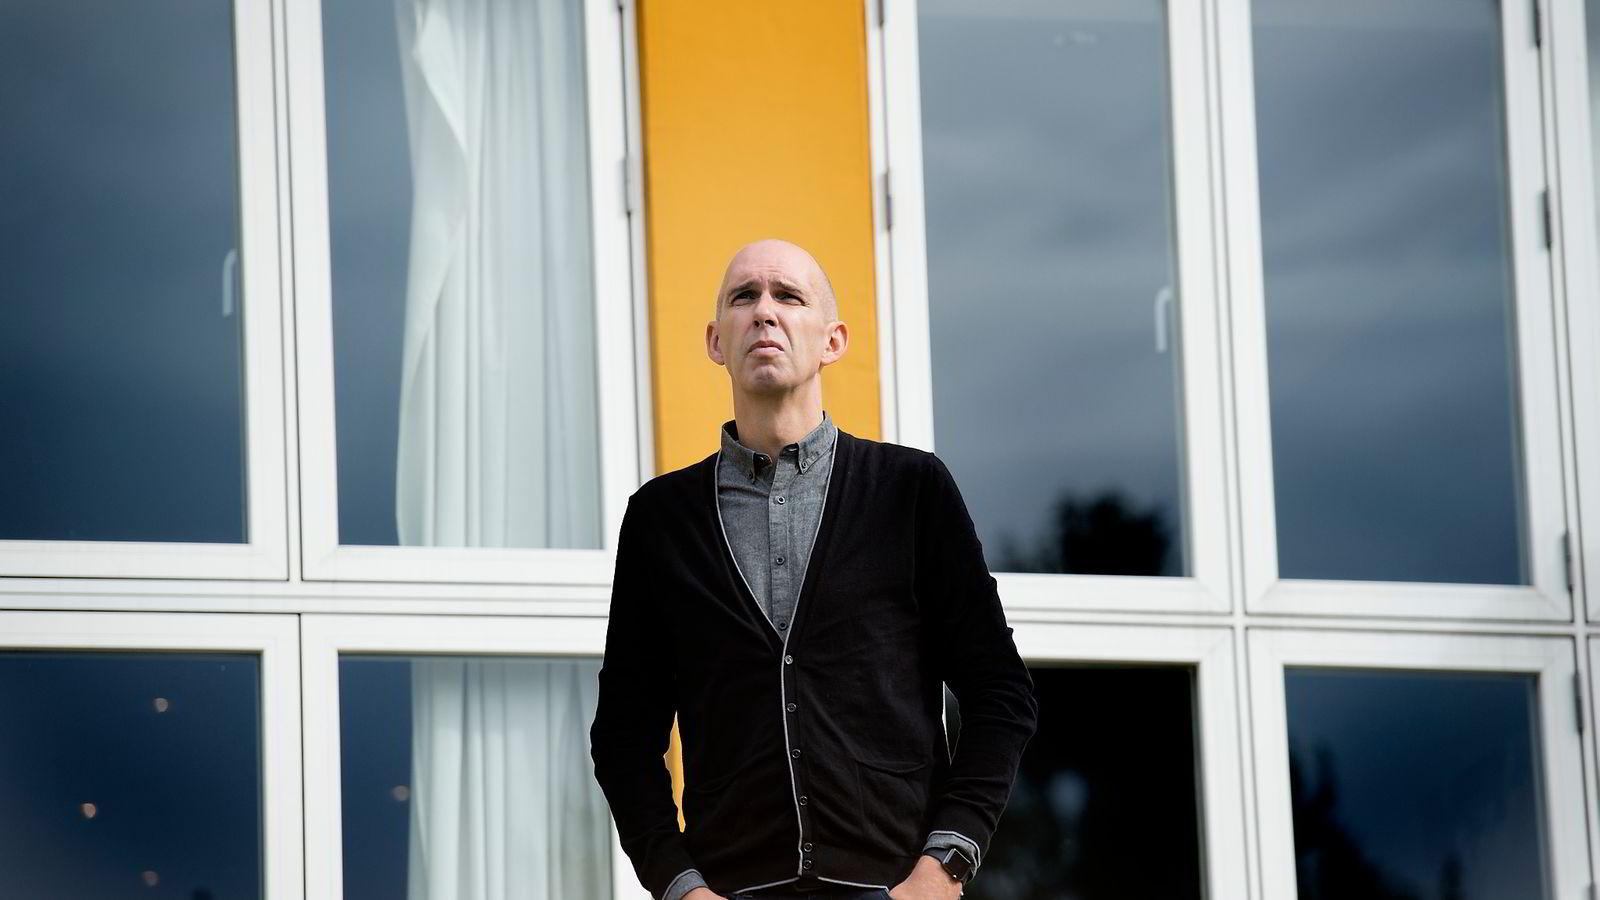 Frank Gander i NRK ber Facebook ta initiativ til å diskutere sensur og ytringsfrihet med norske publisister.